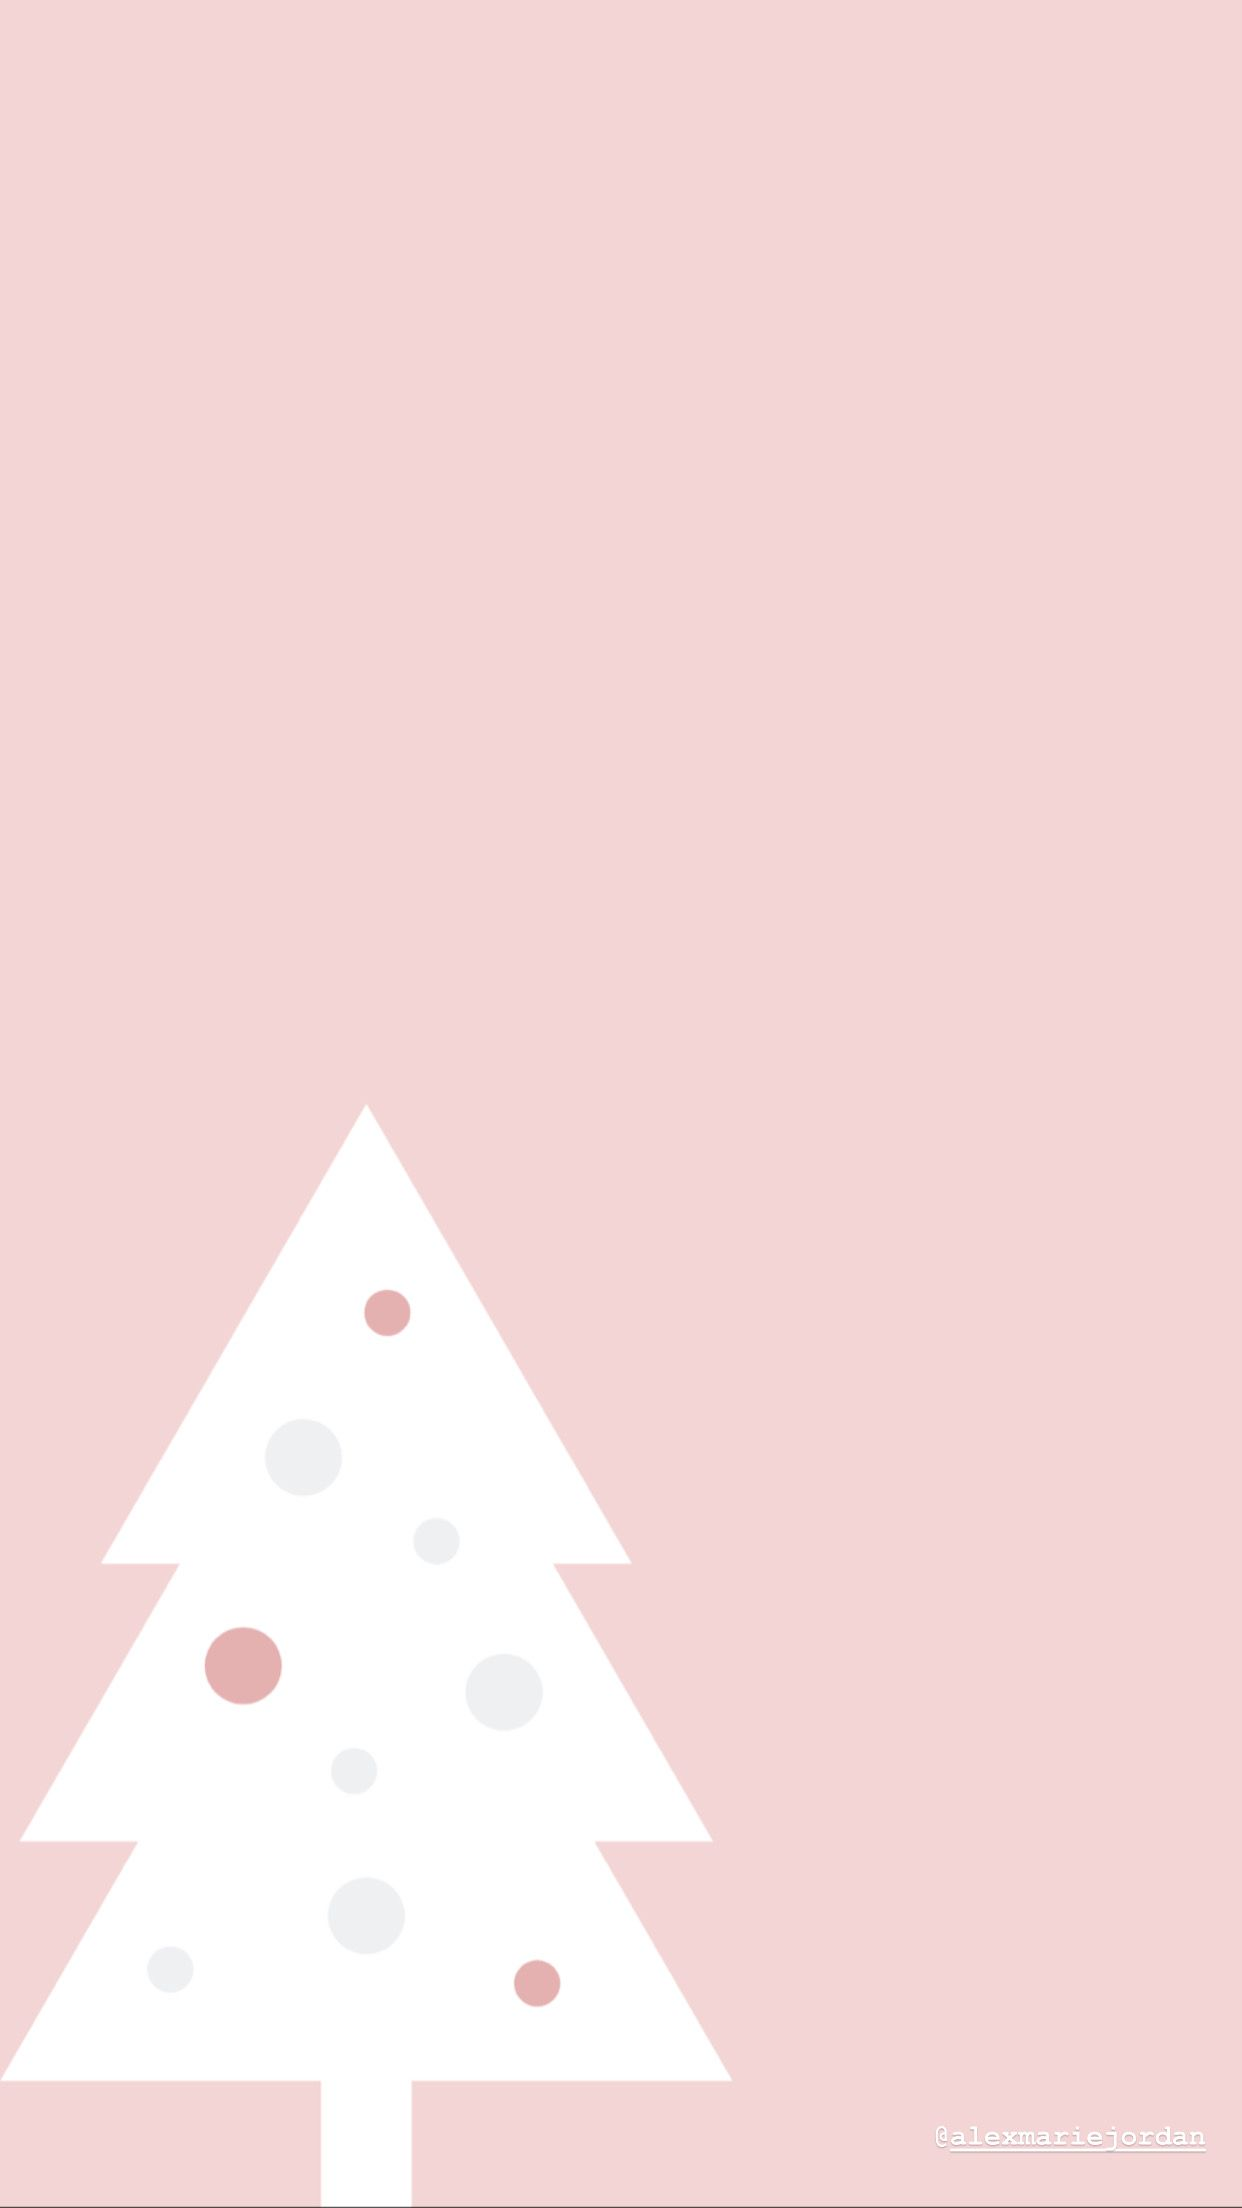 Pink Christmas Tree Wallpaper Christmas Tree Wallpaper Wallpaper Iphone Christmas Cute Christmas Wallpaper